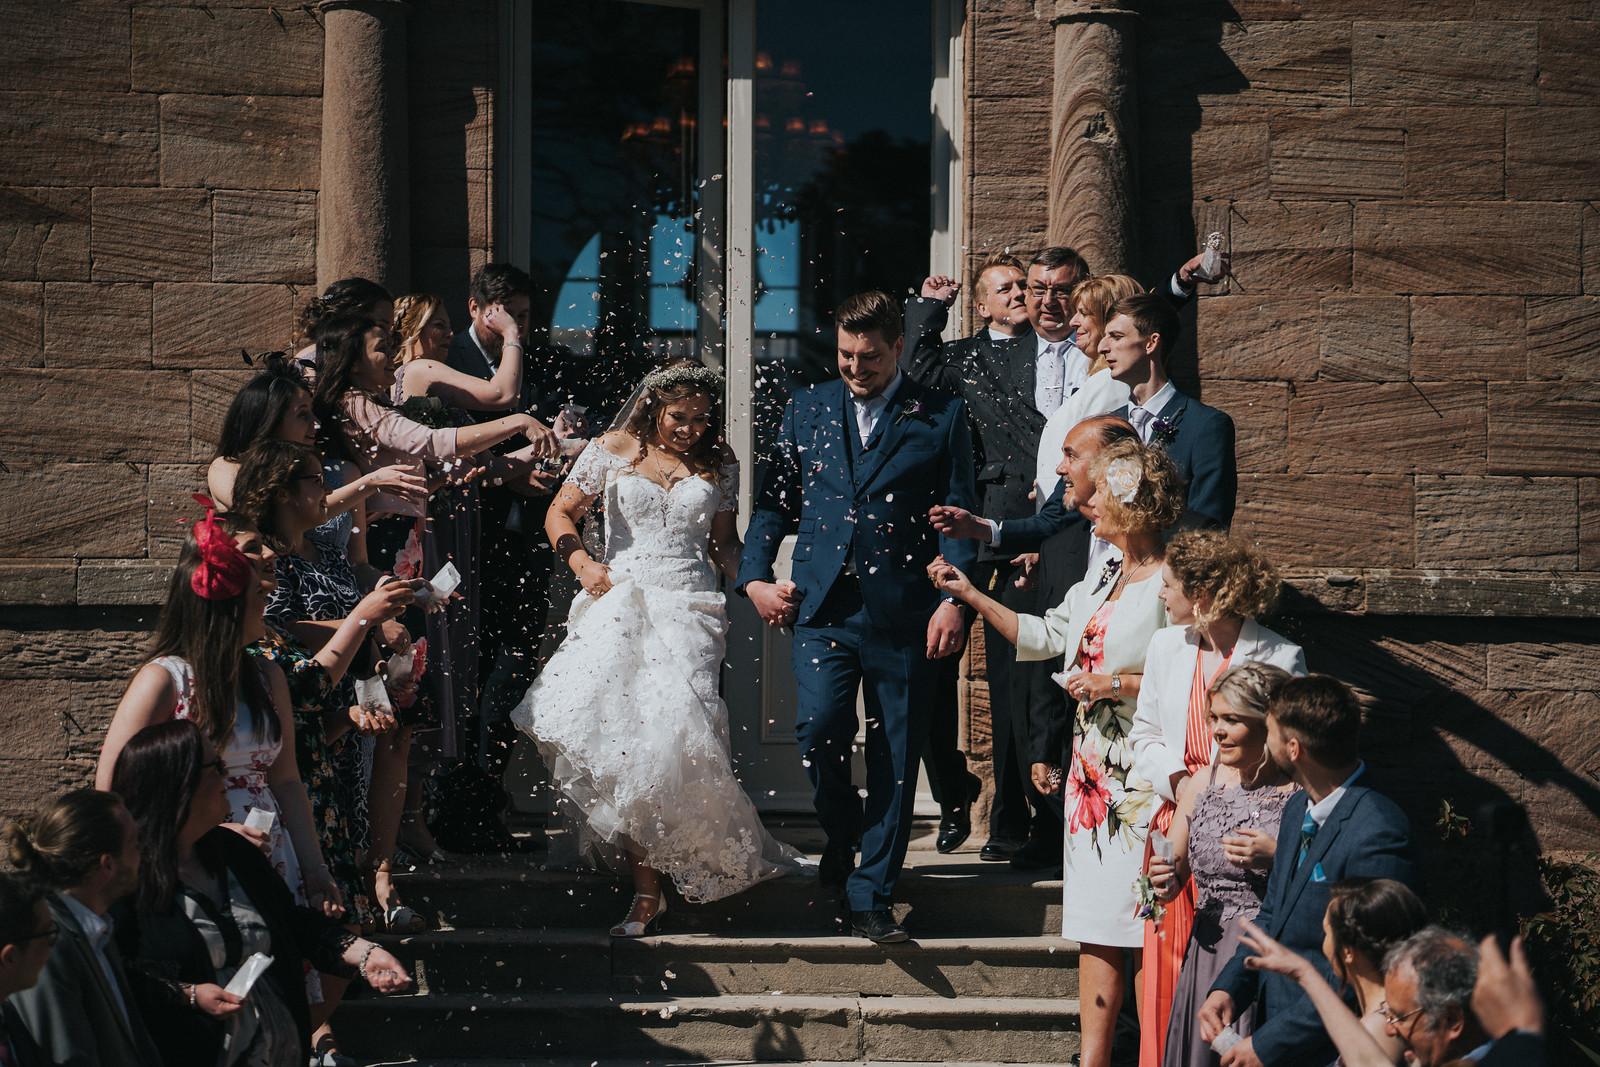 Bride and groom confetti photo - wedding photographers Northumberland